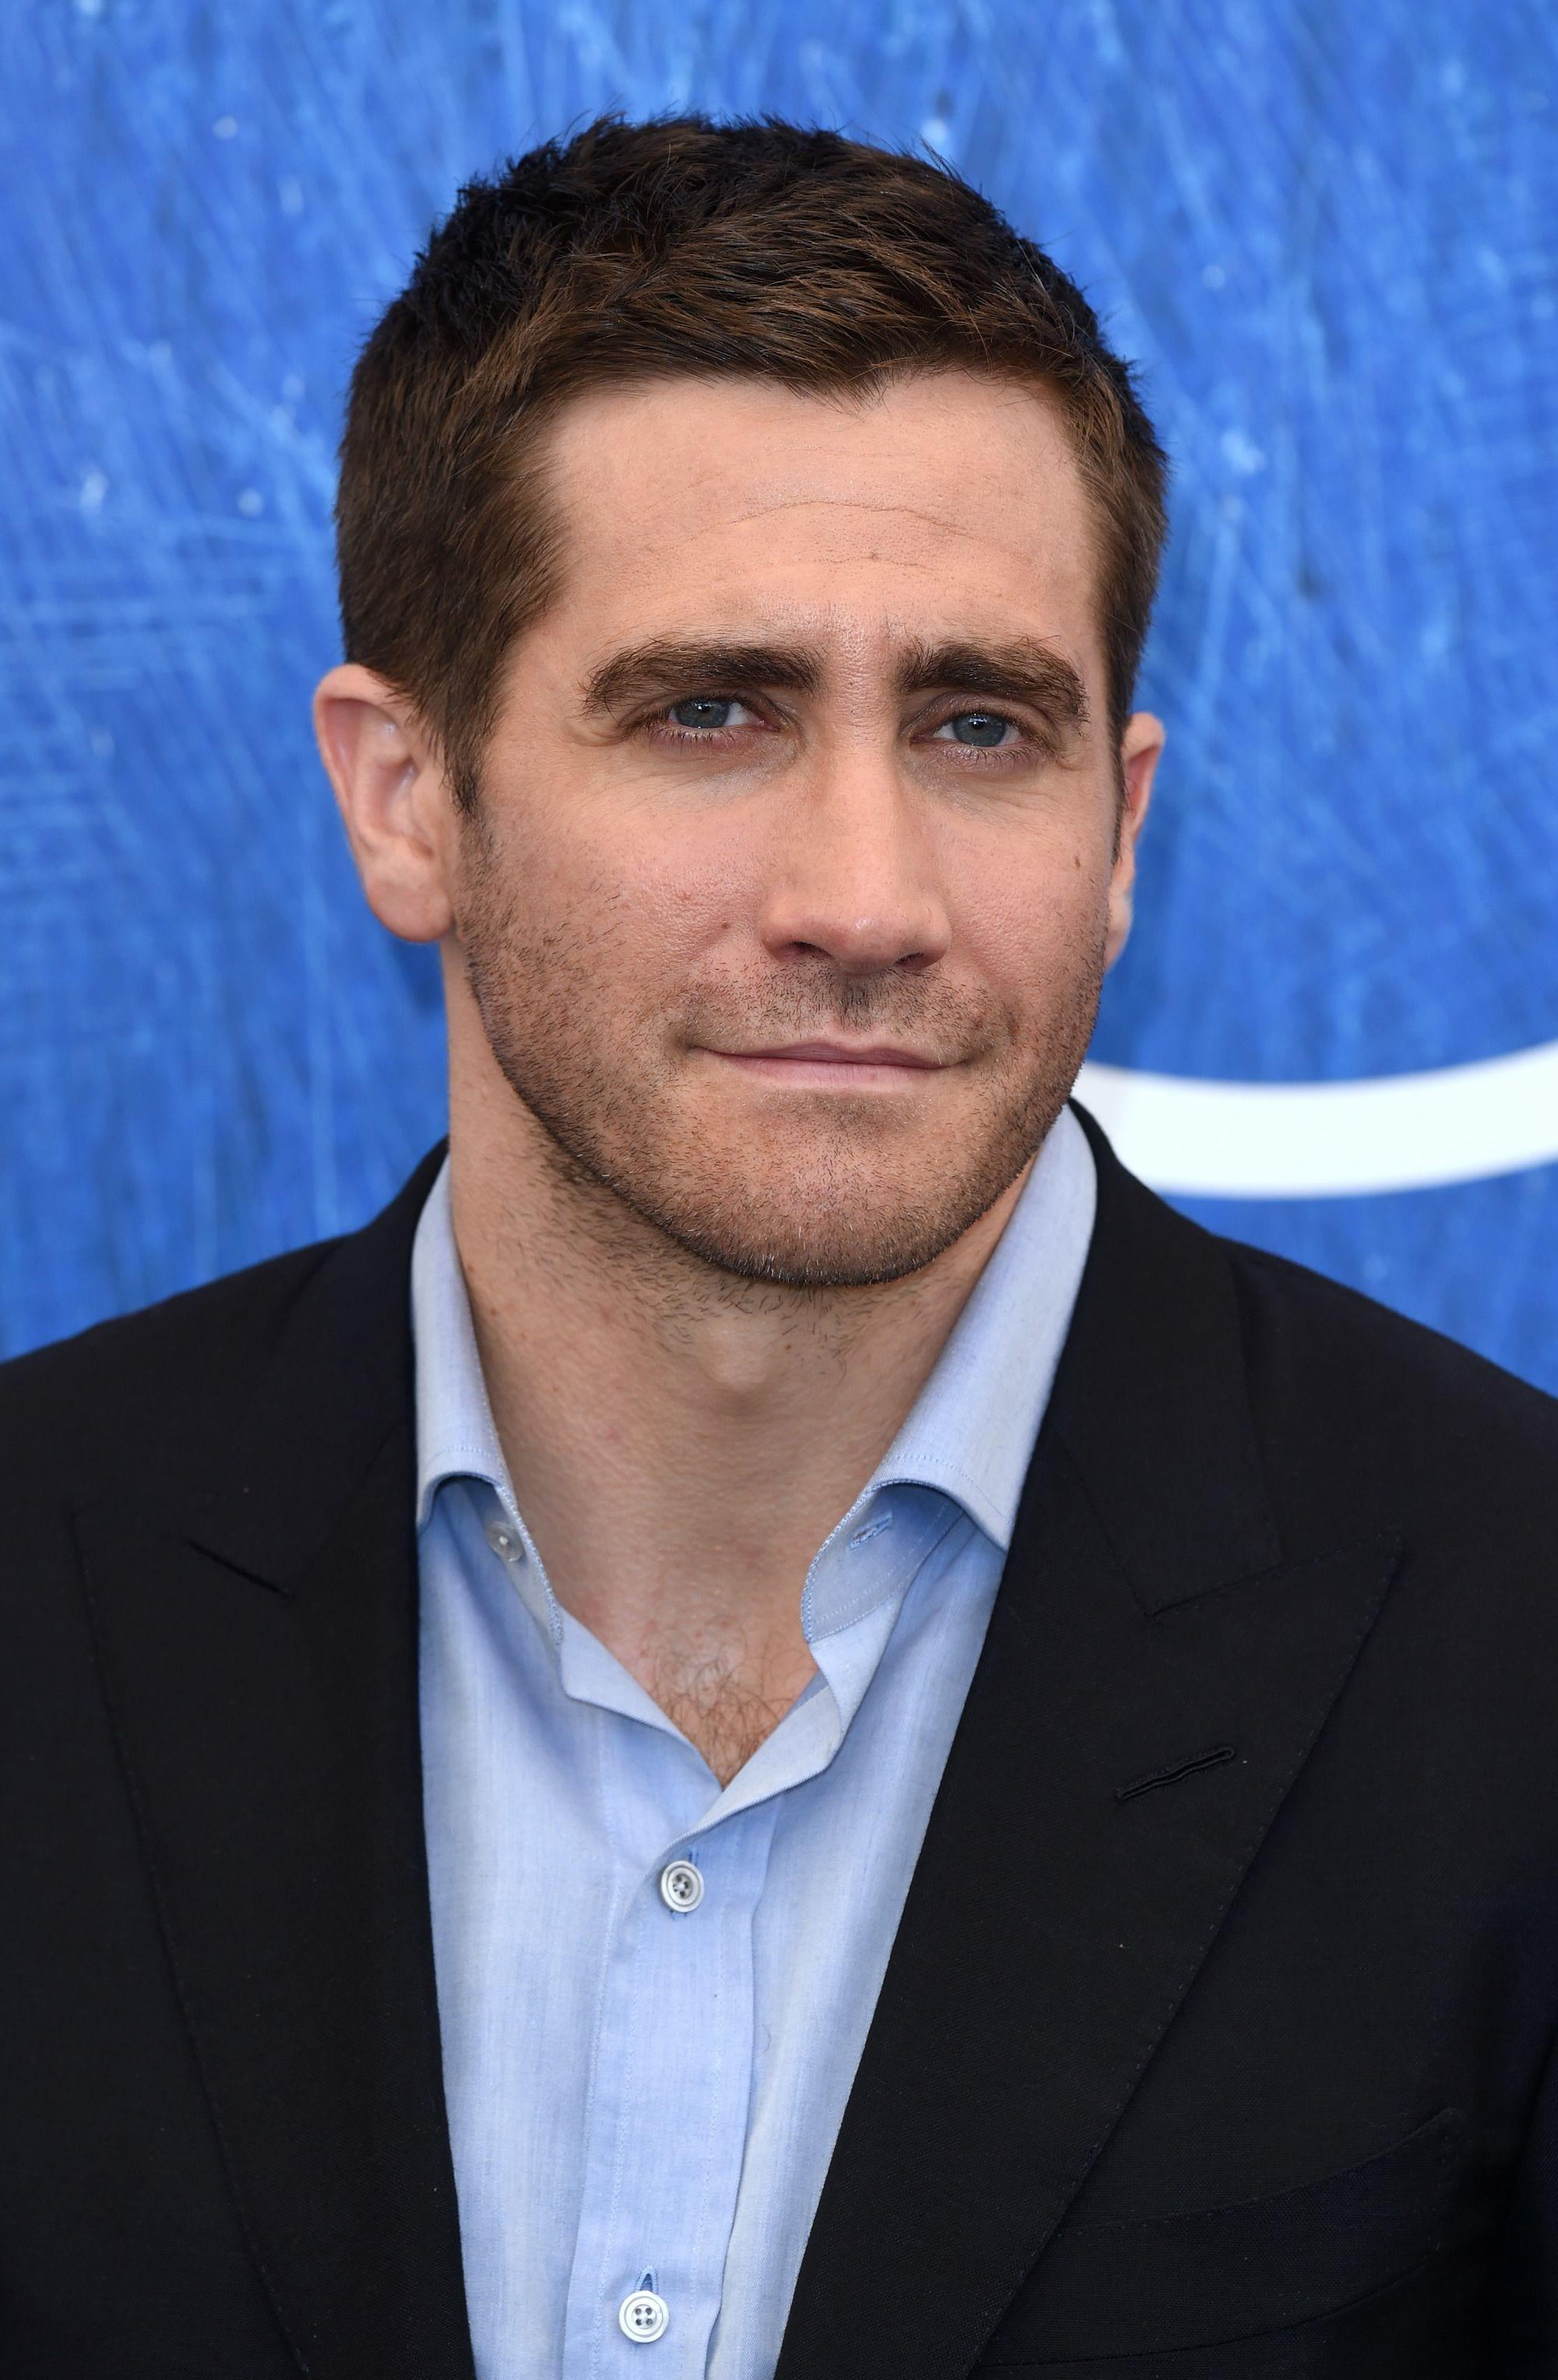 Jake Gyllenhaal brown hair in classic ivy league style